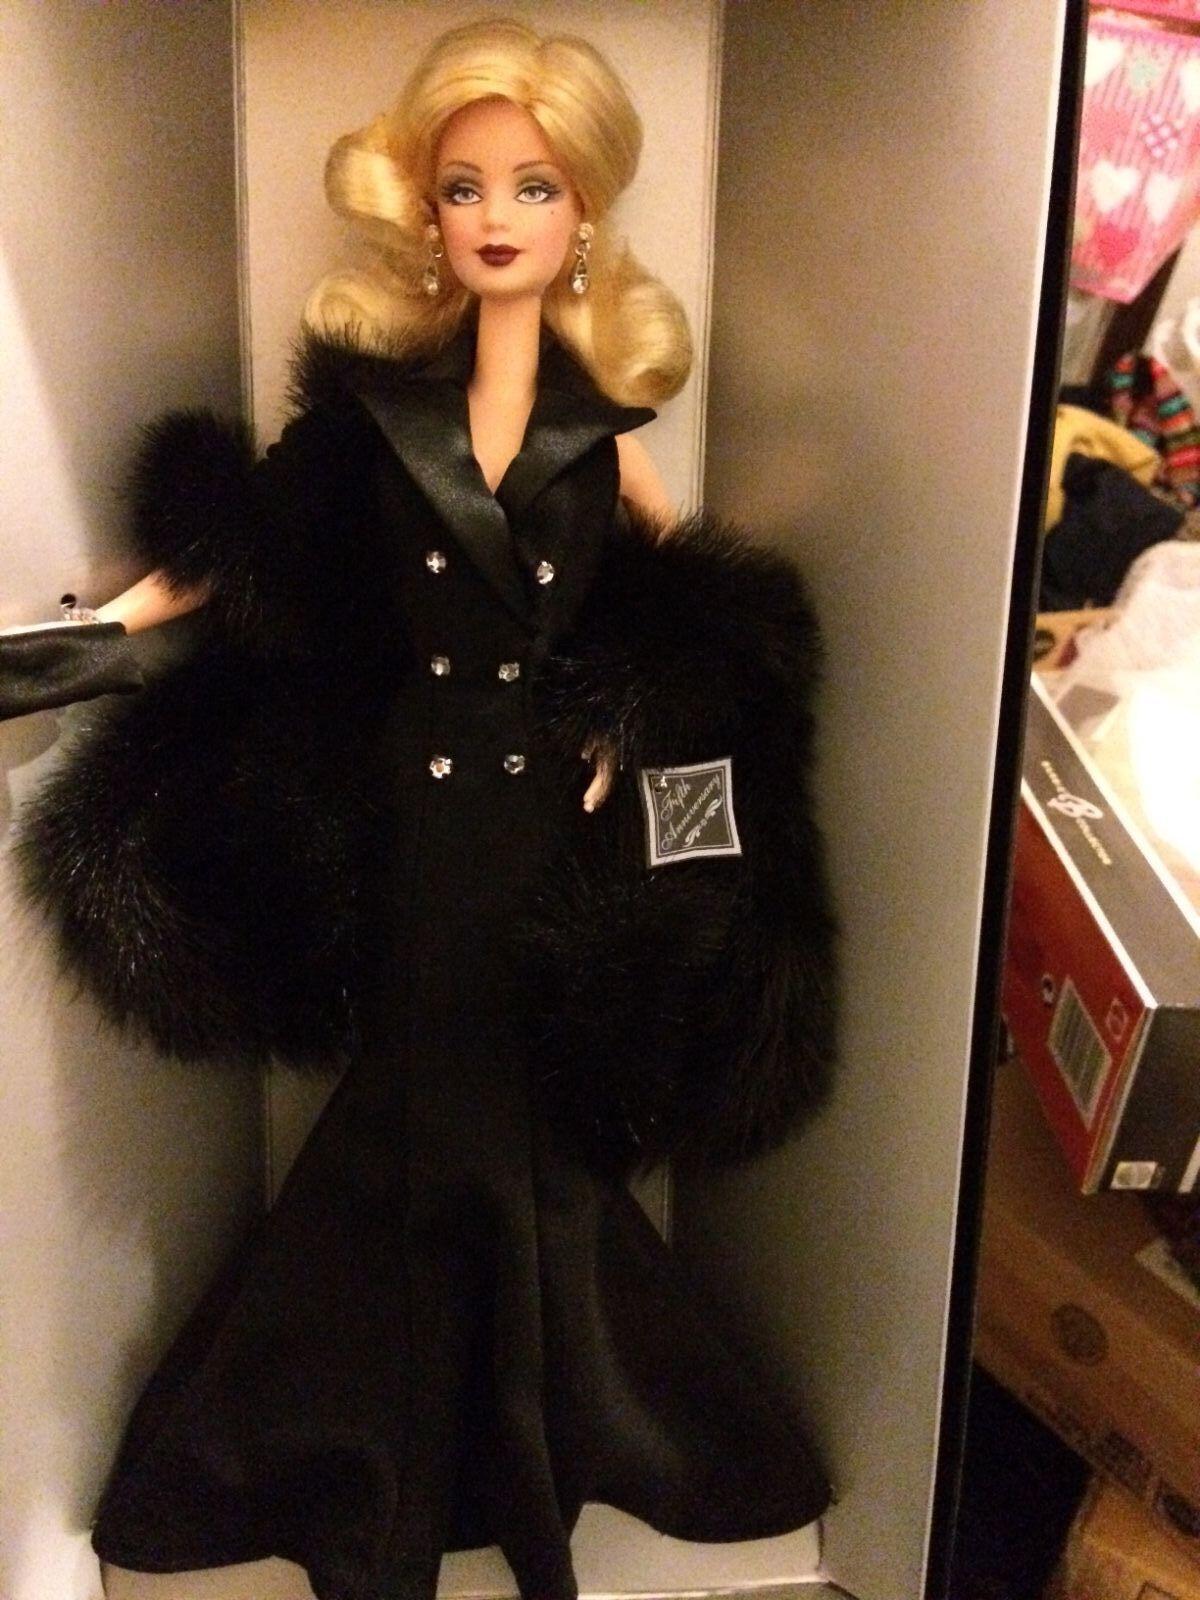 Barbie Coleccionistas Club, medianoche Esmoquin Barbie